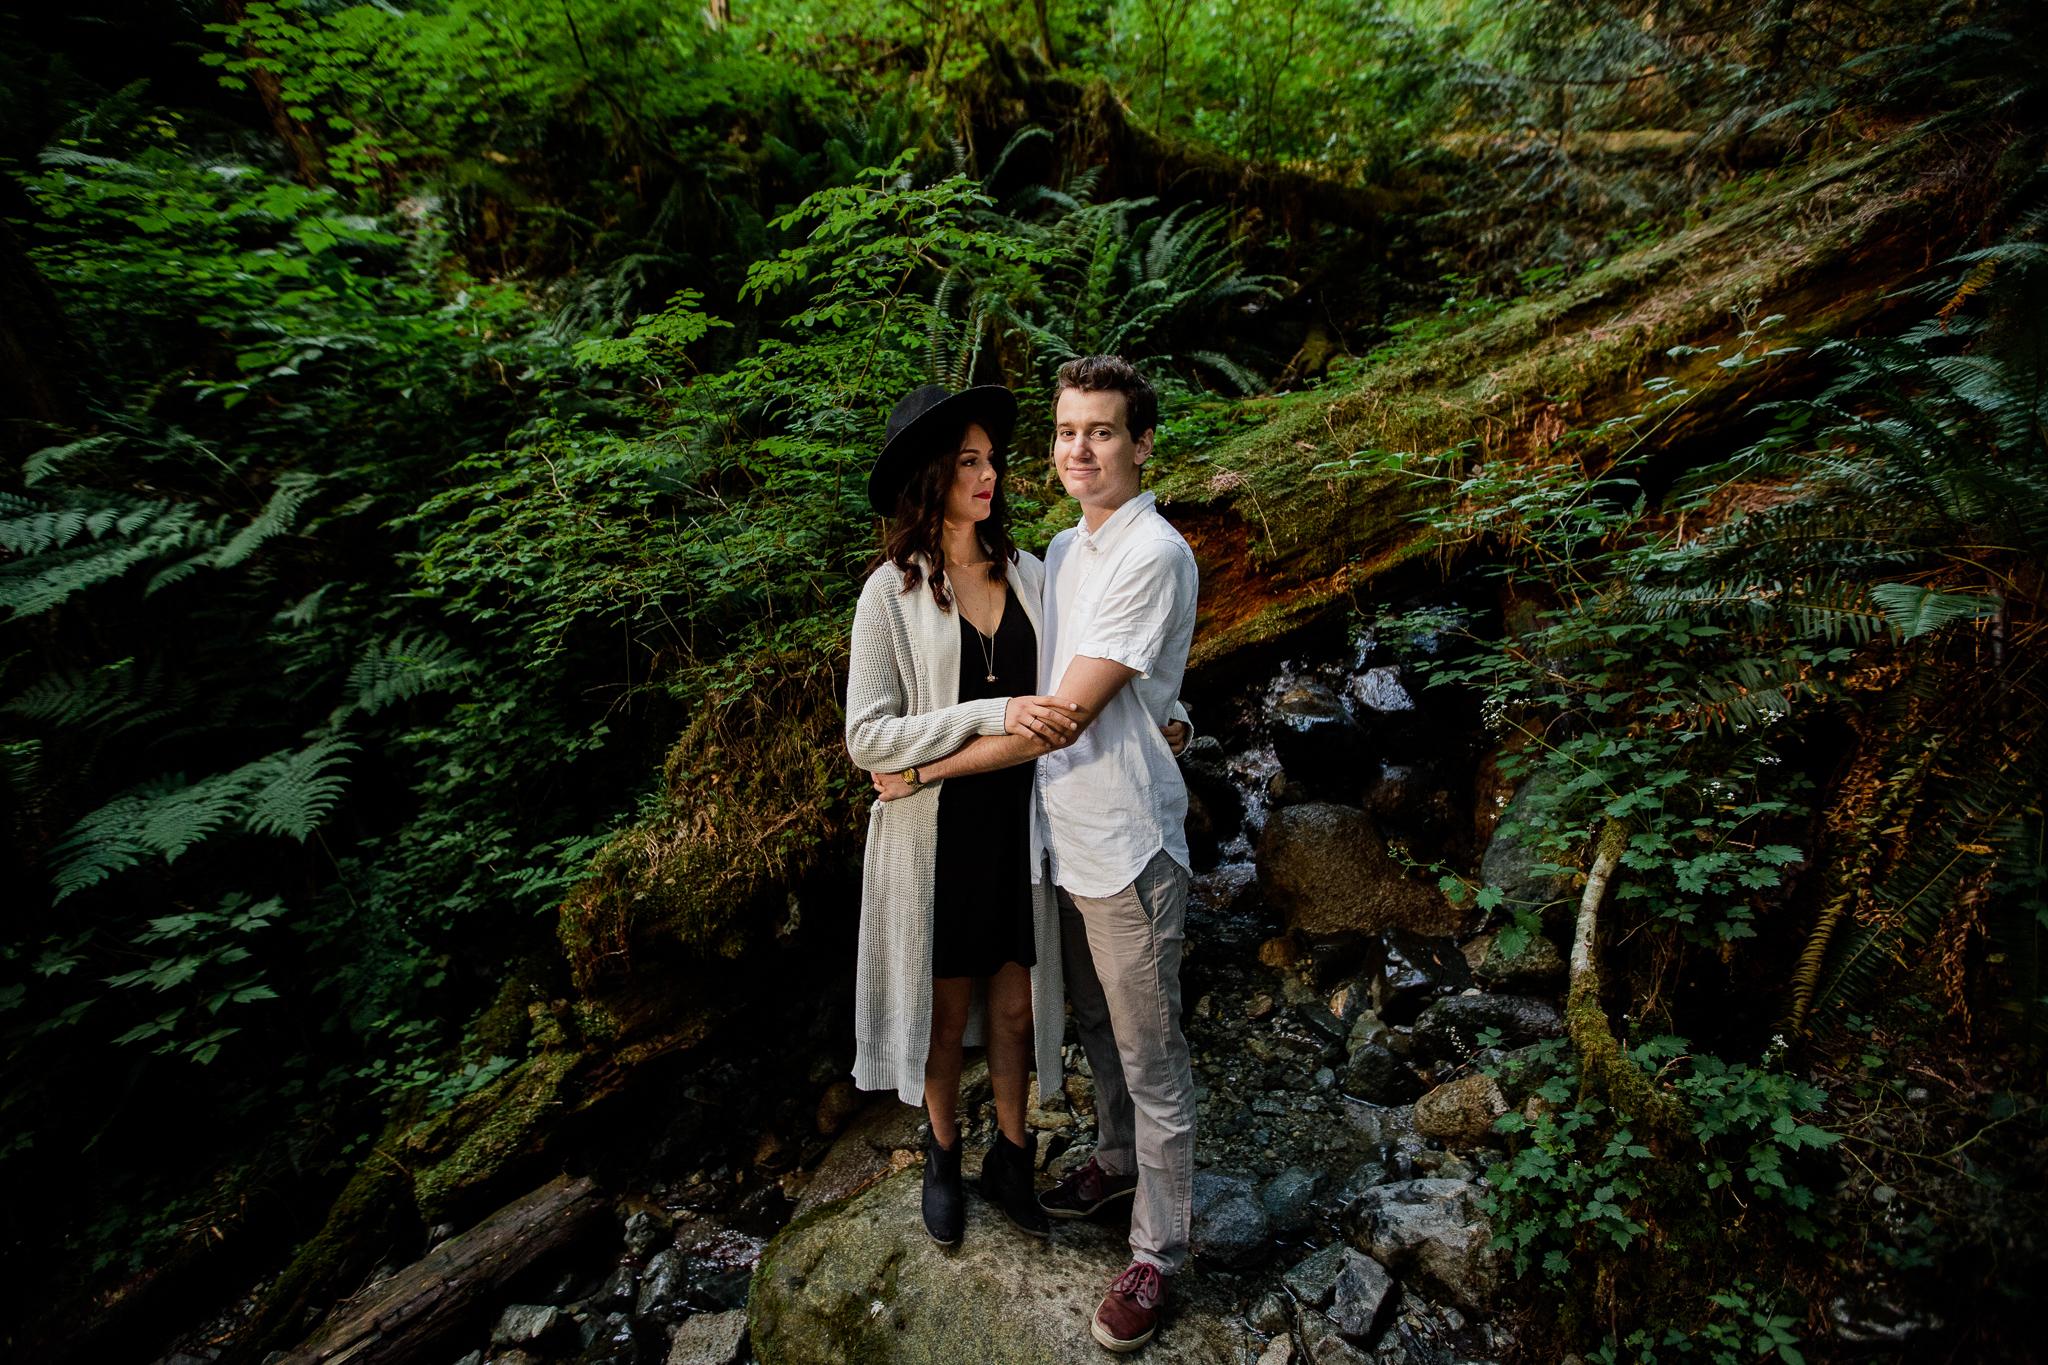 Photo of Buntzen Lake Anmore British Columbia Landscape Best Fun Engagement Photographer Port Moody Wedding Sunset Romantic Couple Photos 035.jpg